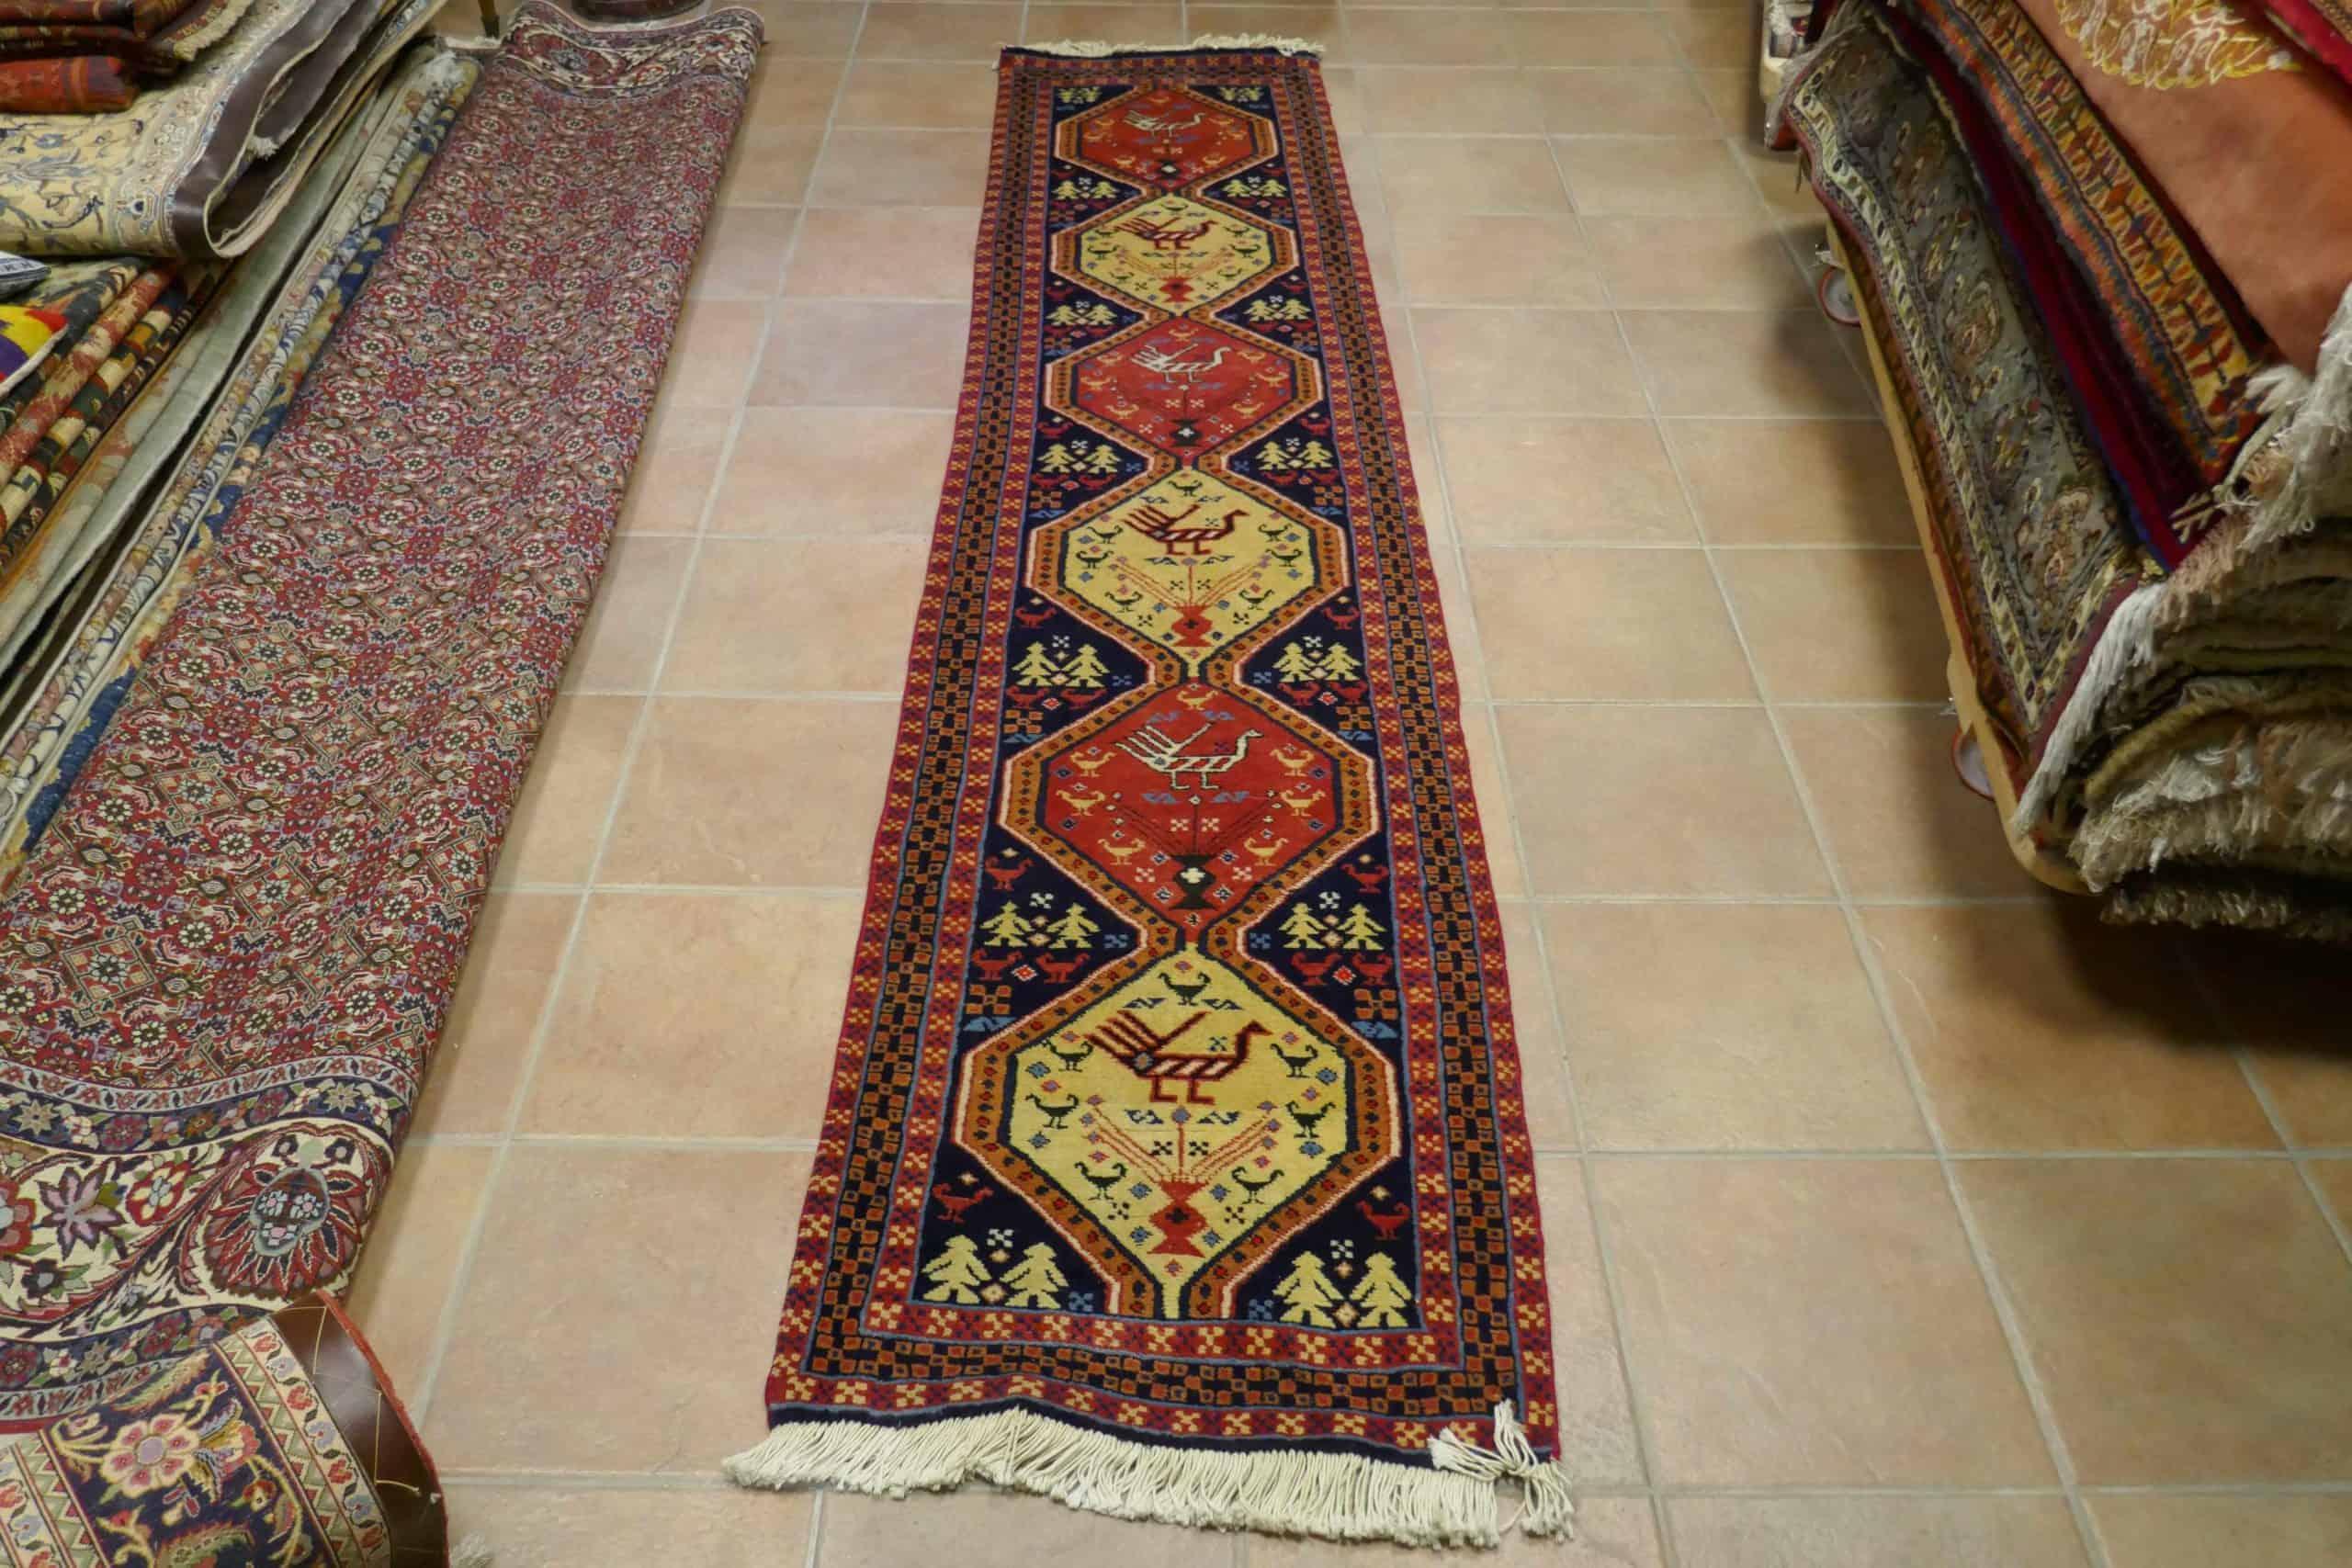 Azarbaijan Persia 287x64